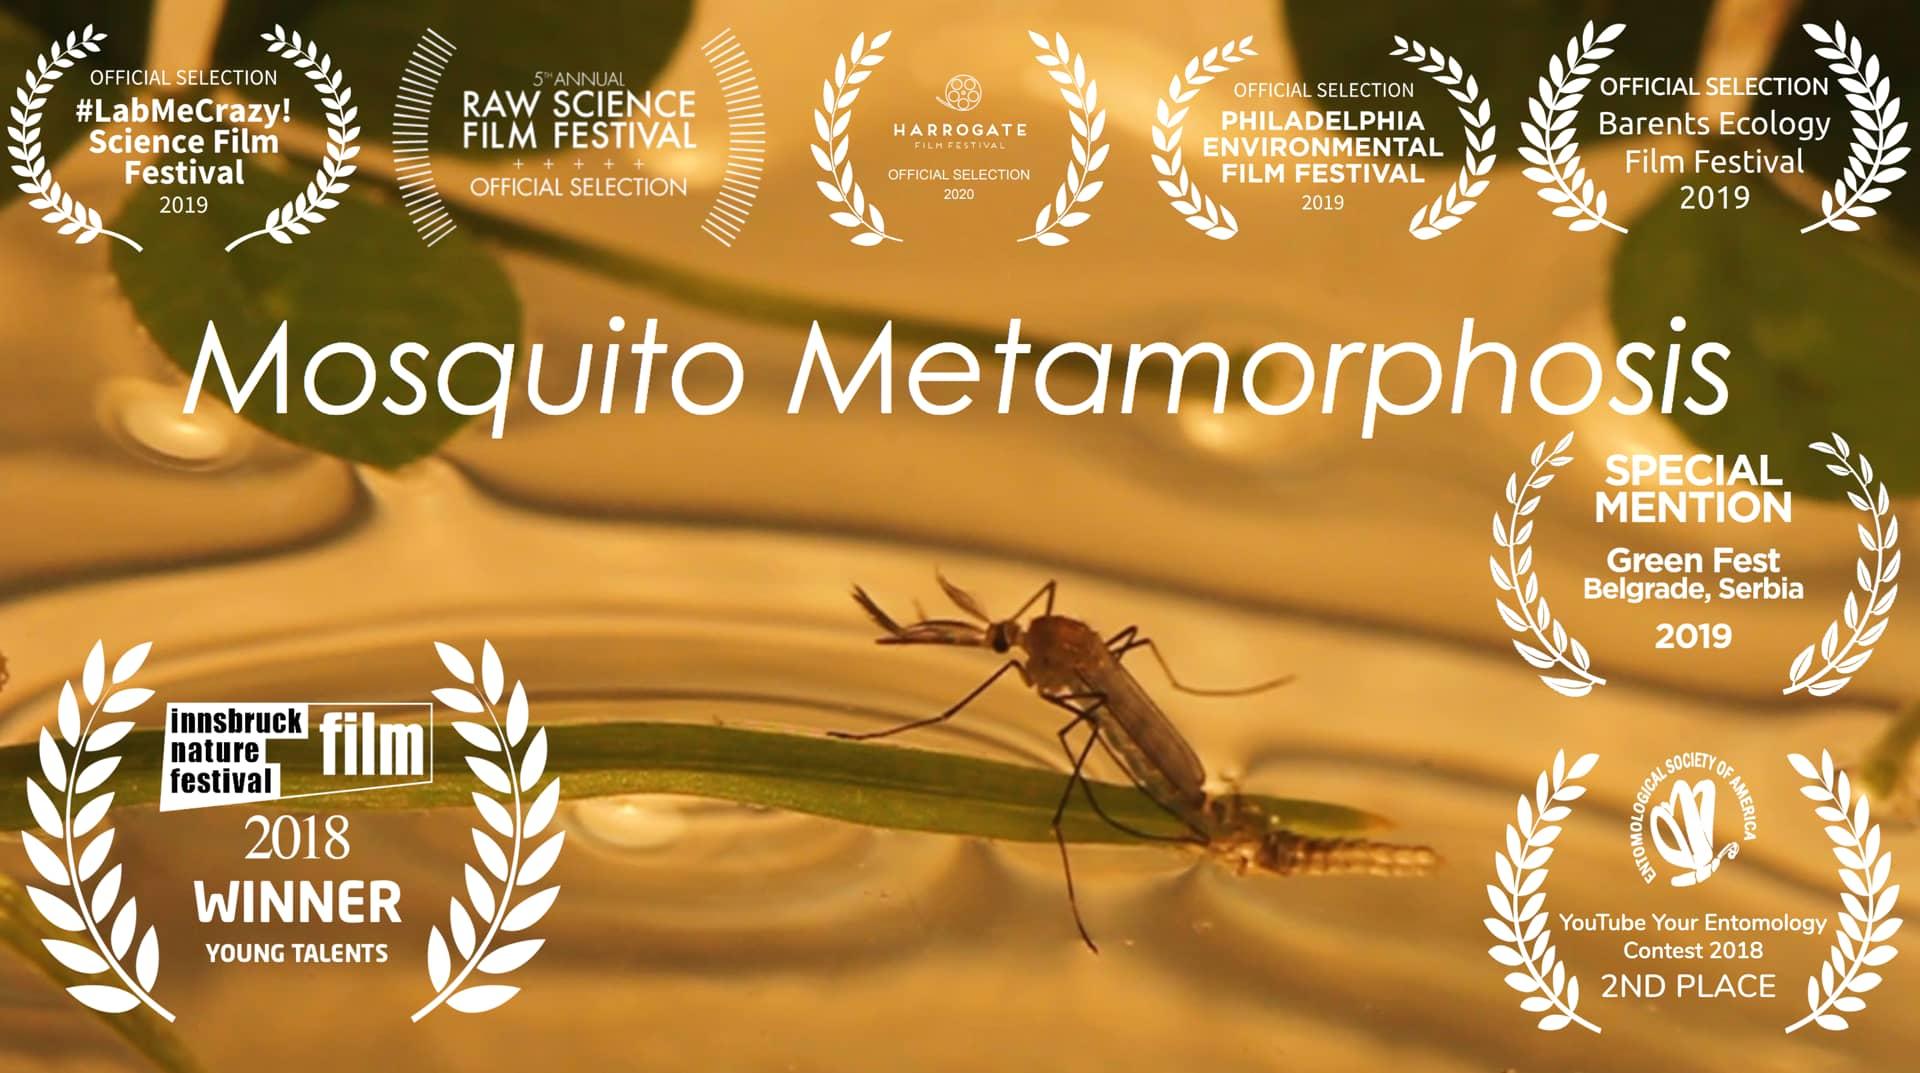 Mosquito Metamorphosis